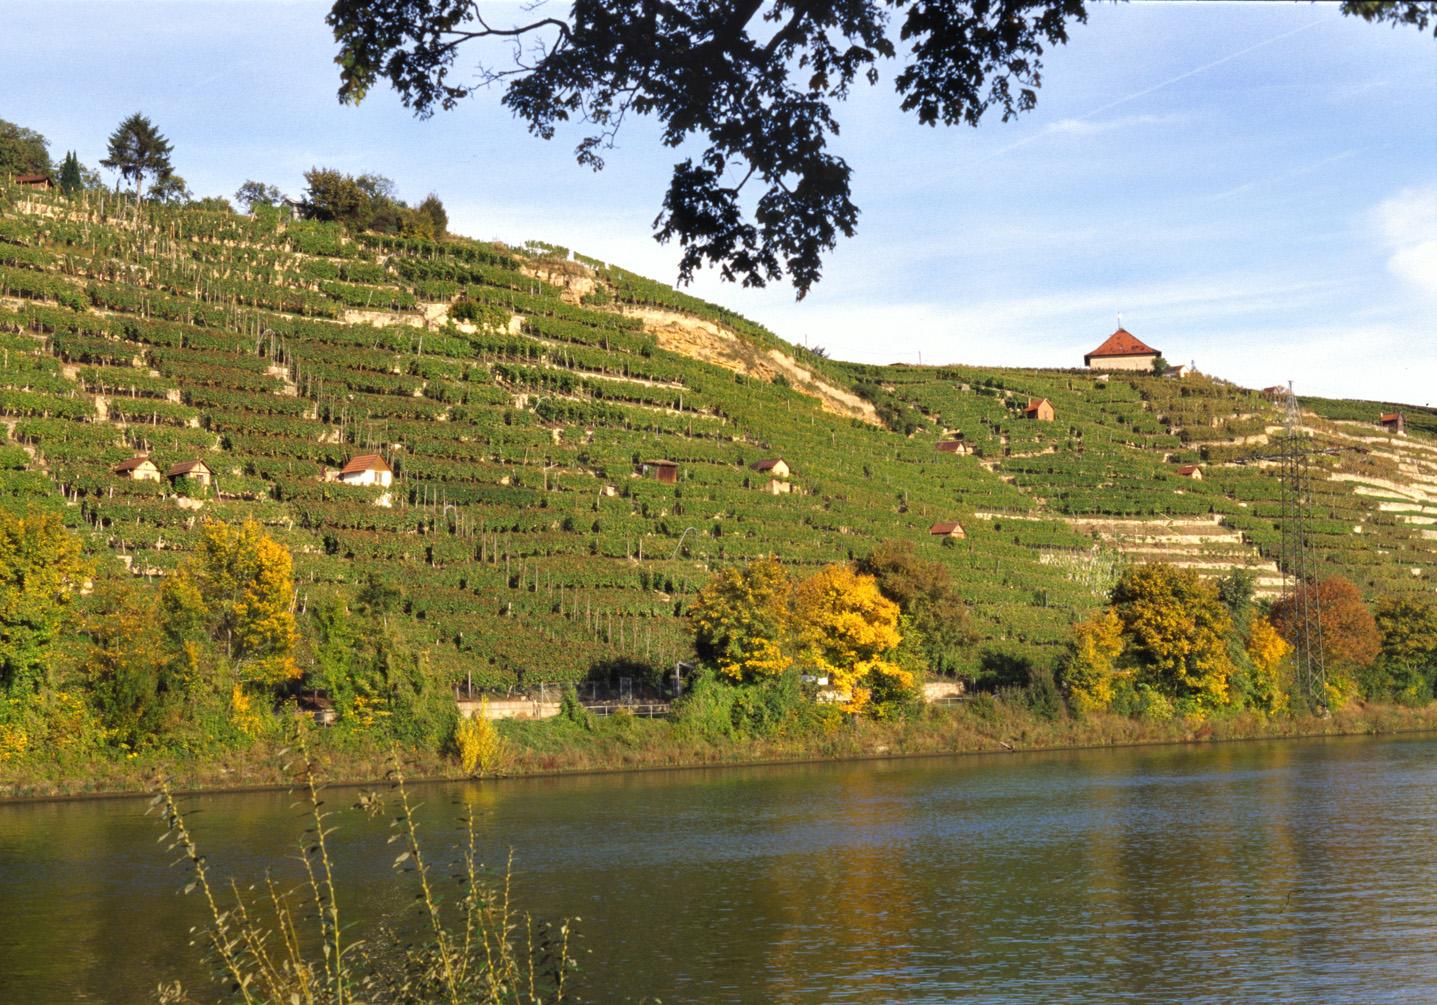 The well-knownCannstatter Zuckerle vineyard situated in terraces on the river Neckar, is in Bad Cannstatt, a part of Stuttgart.